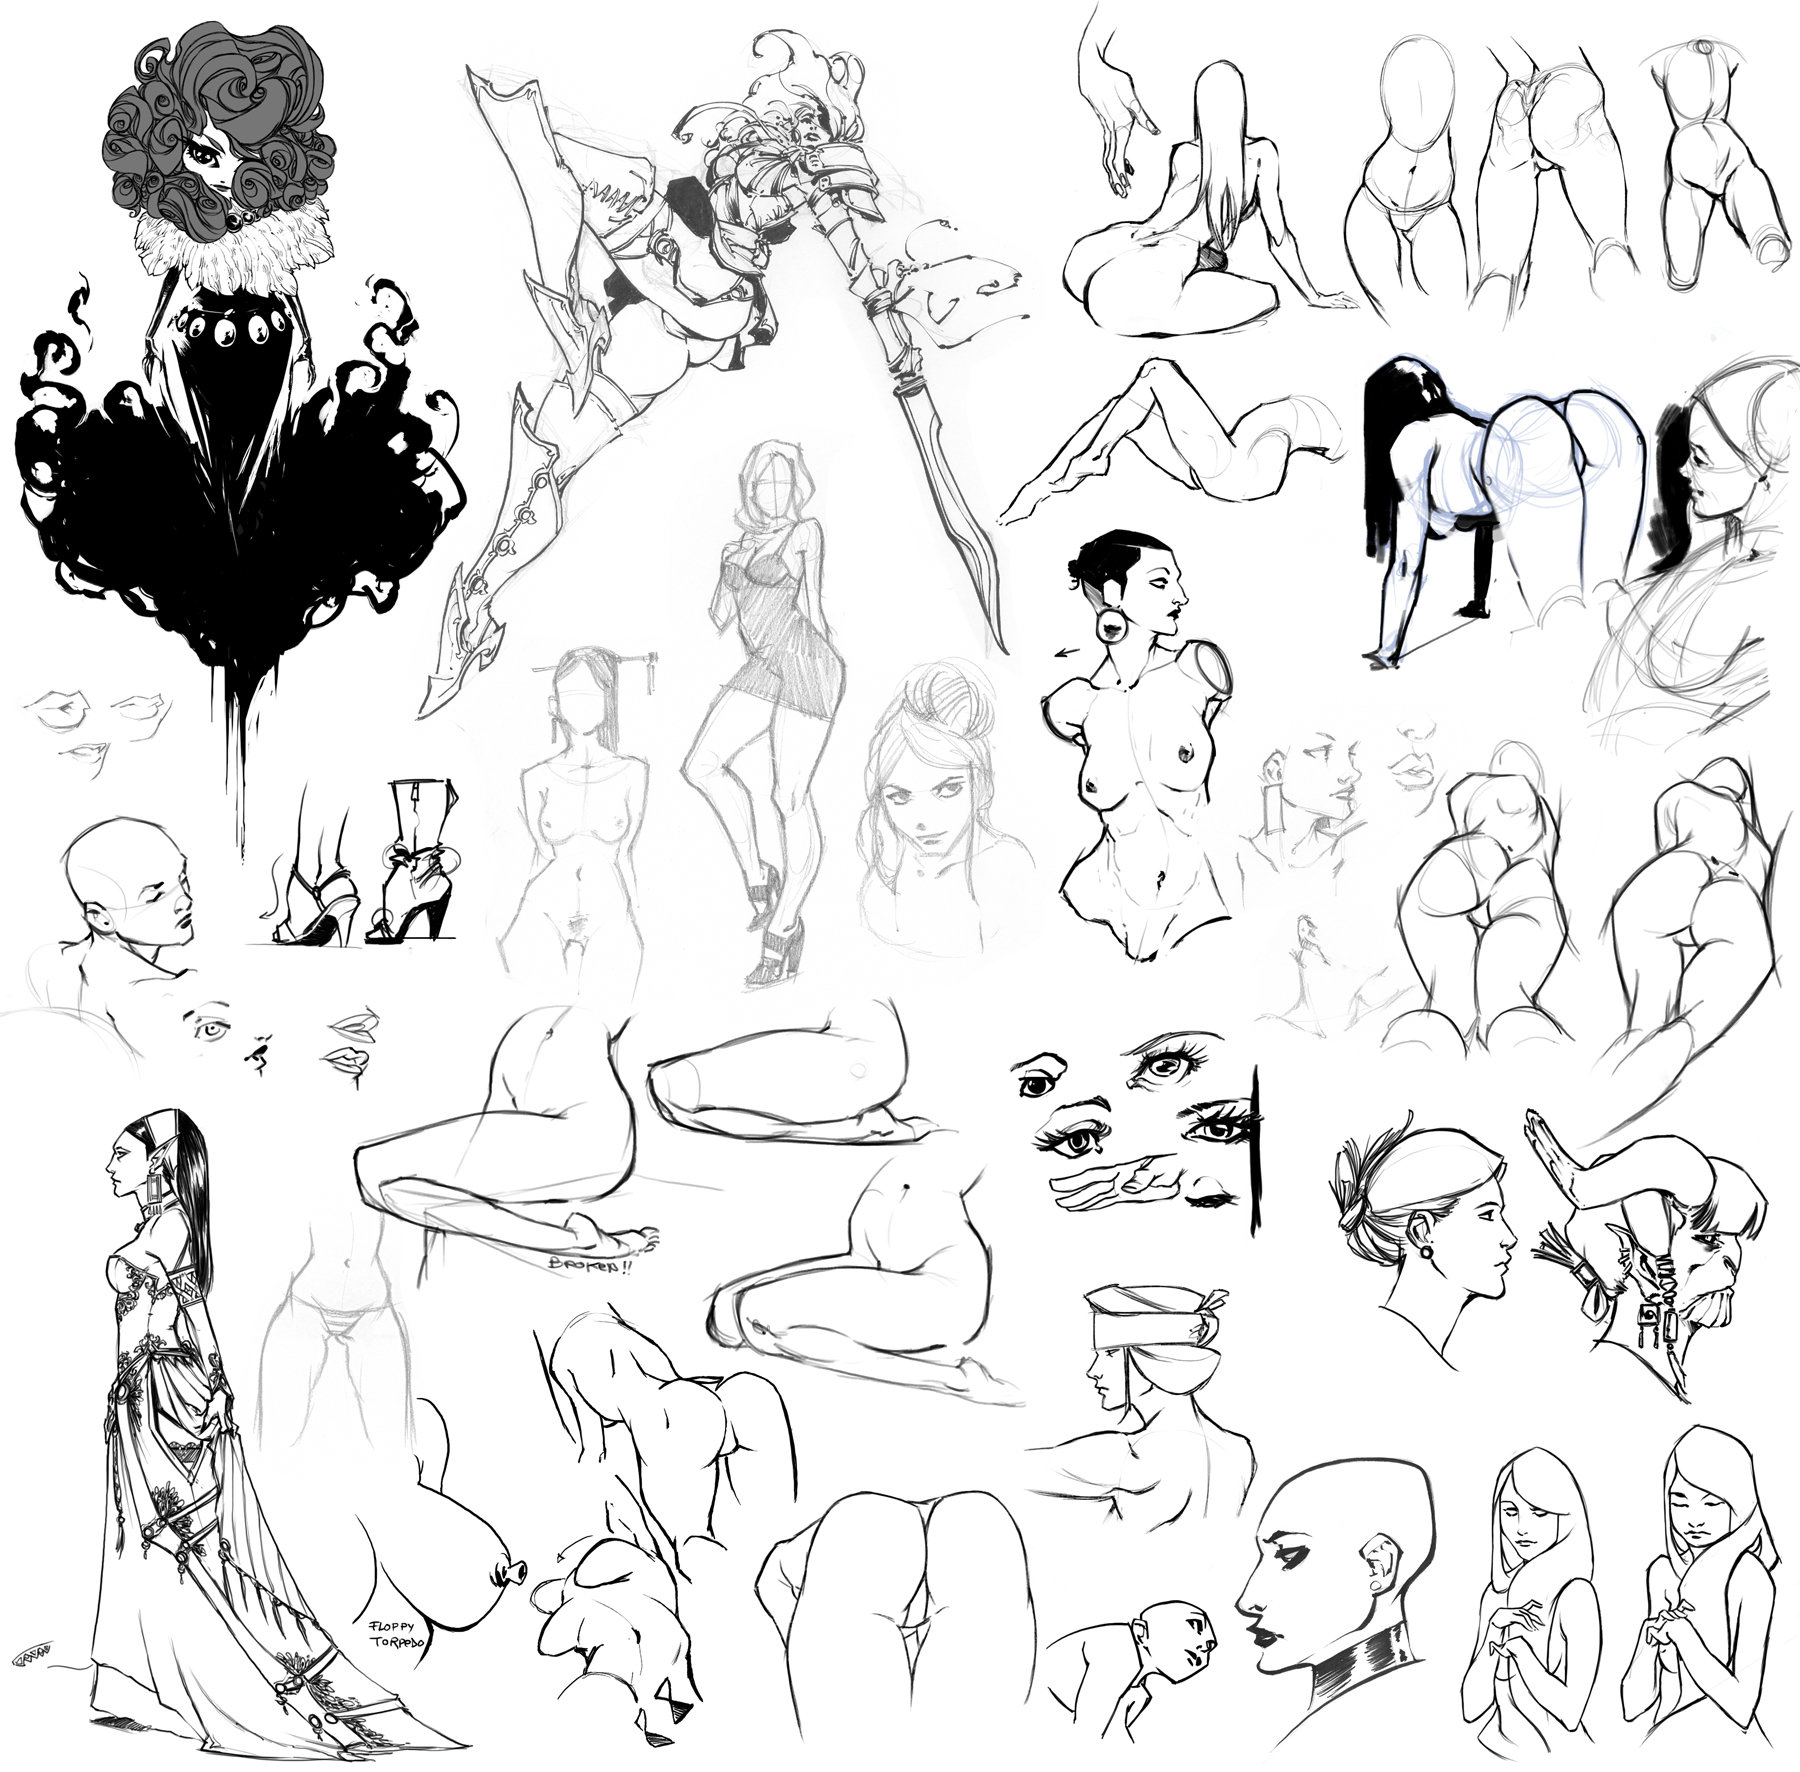 david-sequeira-girls-and-ladys-03